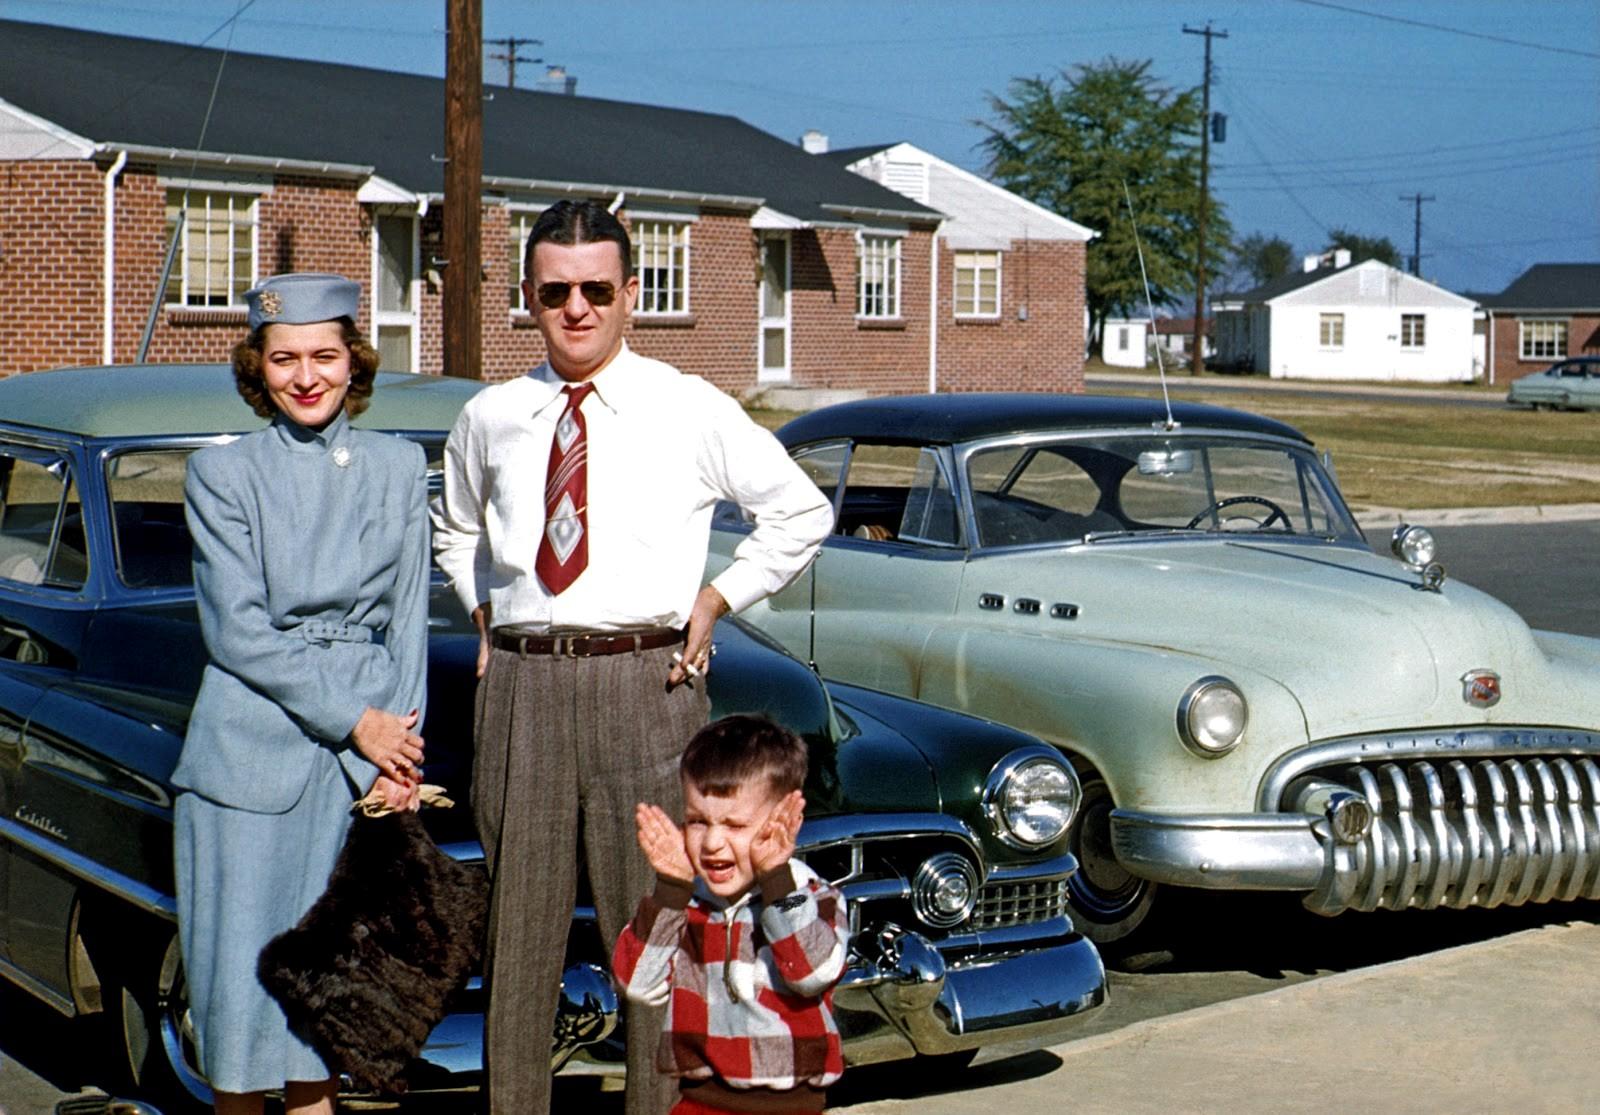 Georgia, 1951